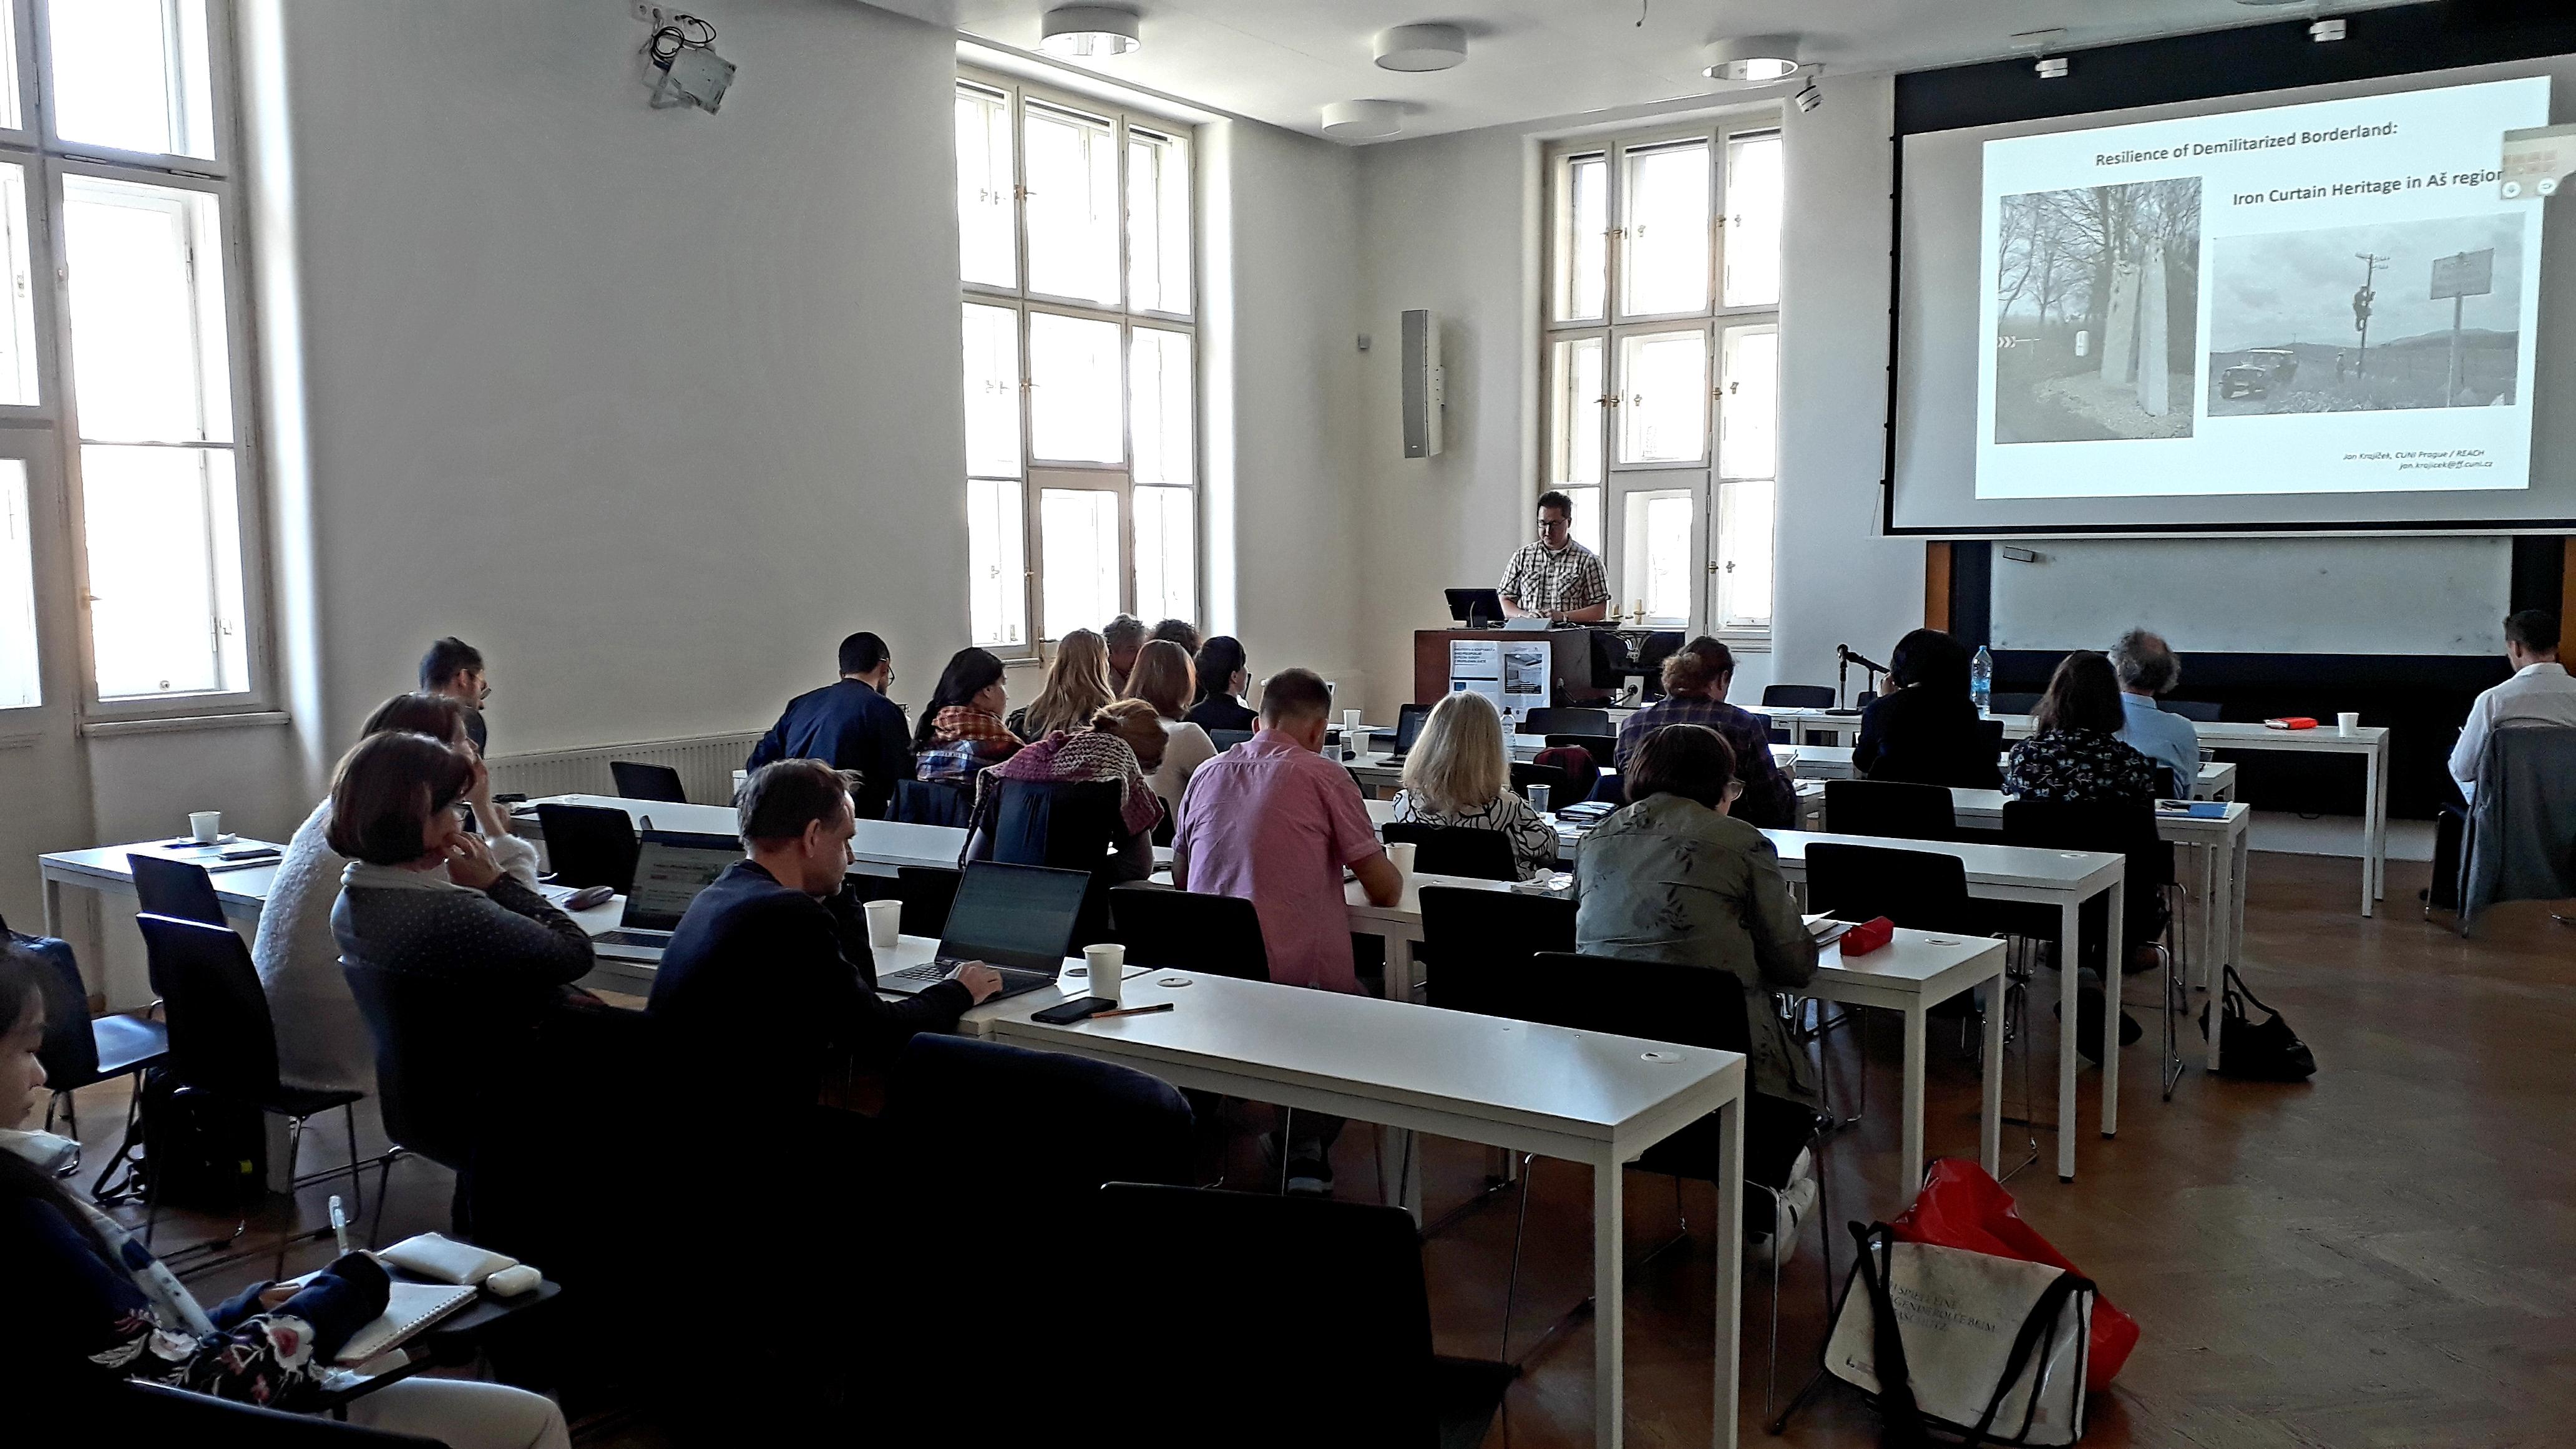 "20200305 PhDr. Jan Krajíček, REACH, Charles University, – ""Resilience of de-militarized borderland: Iron Curtain heritage in Aš region"" (Czech Republic)"